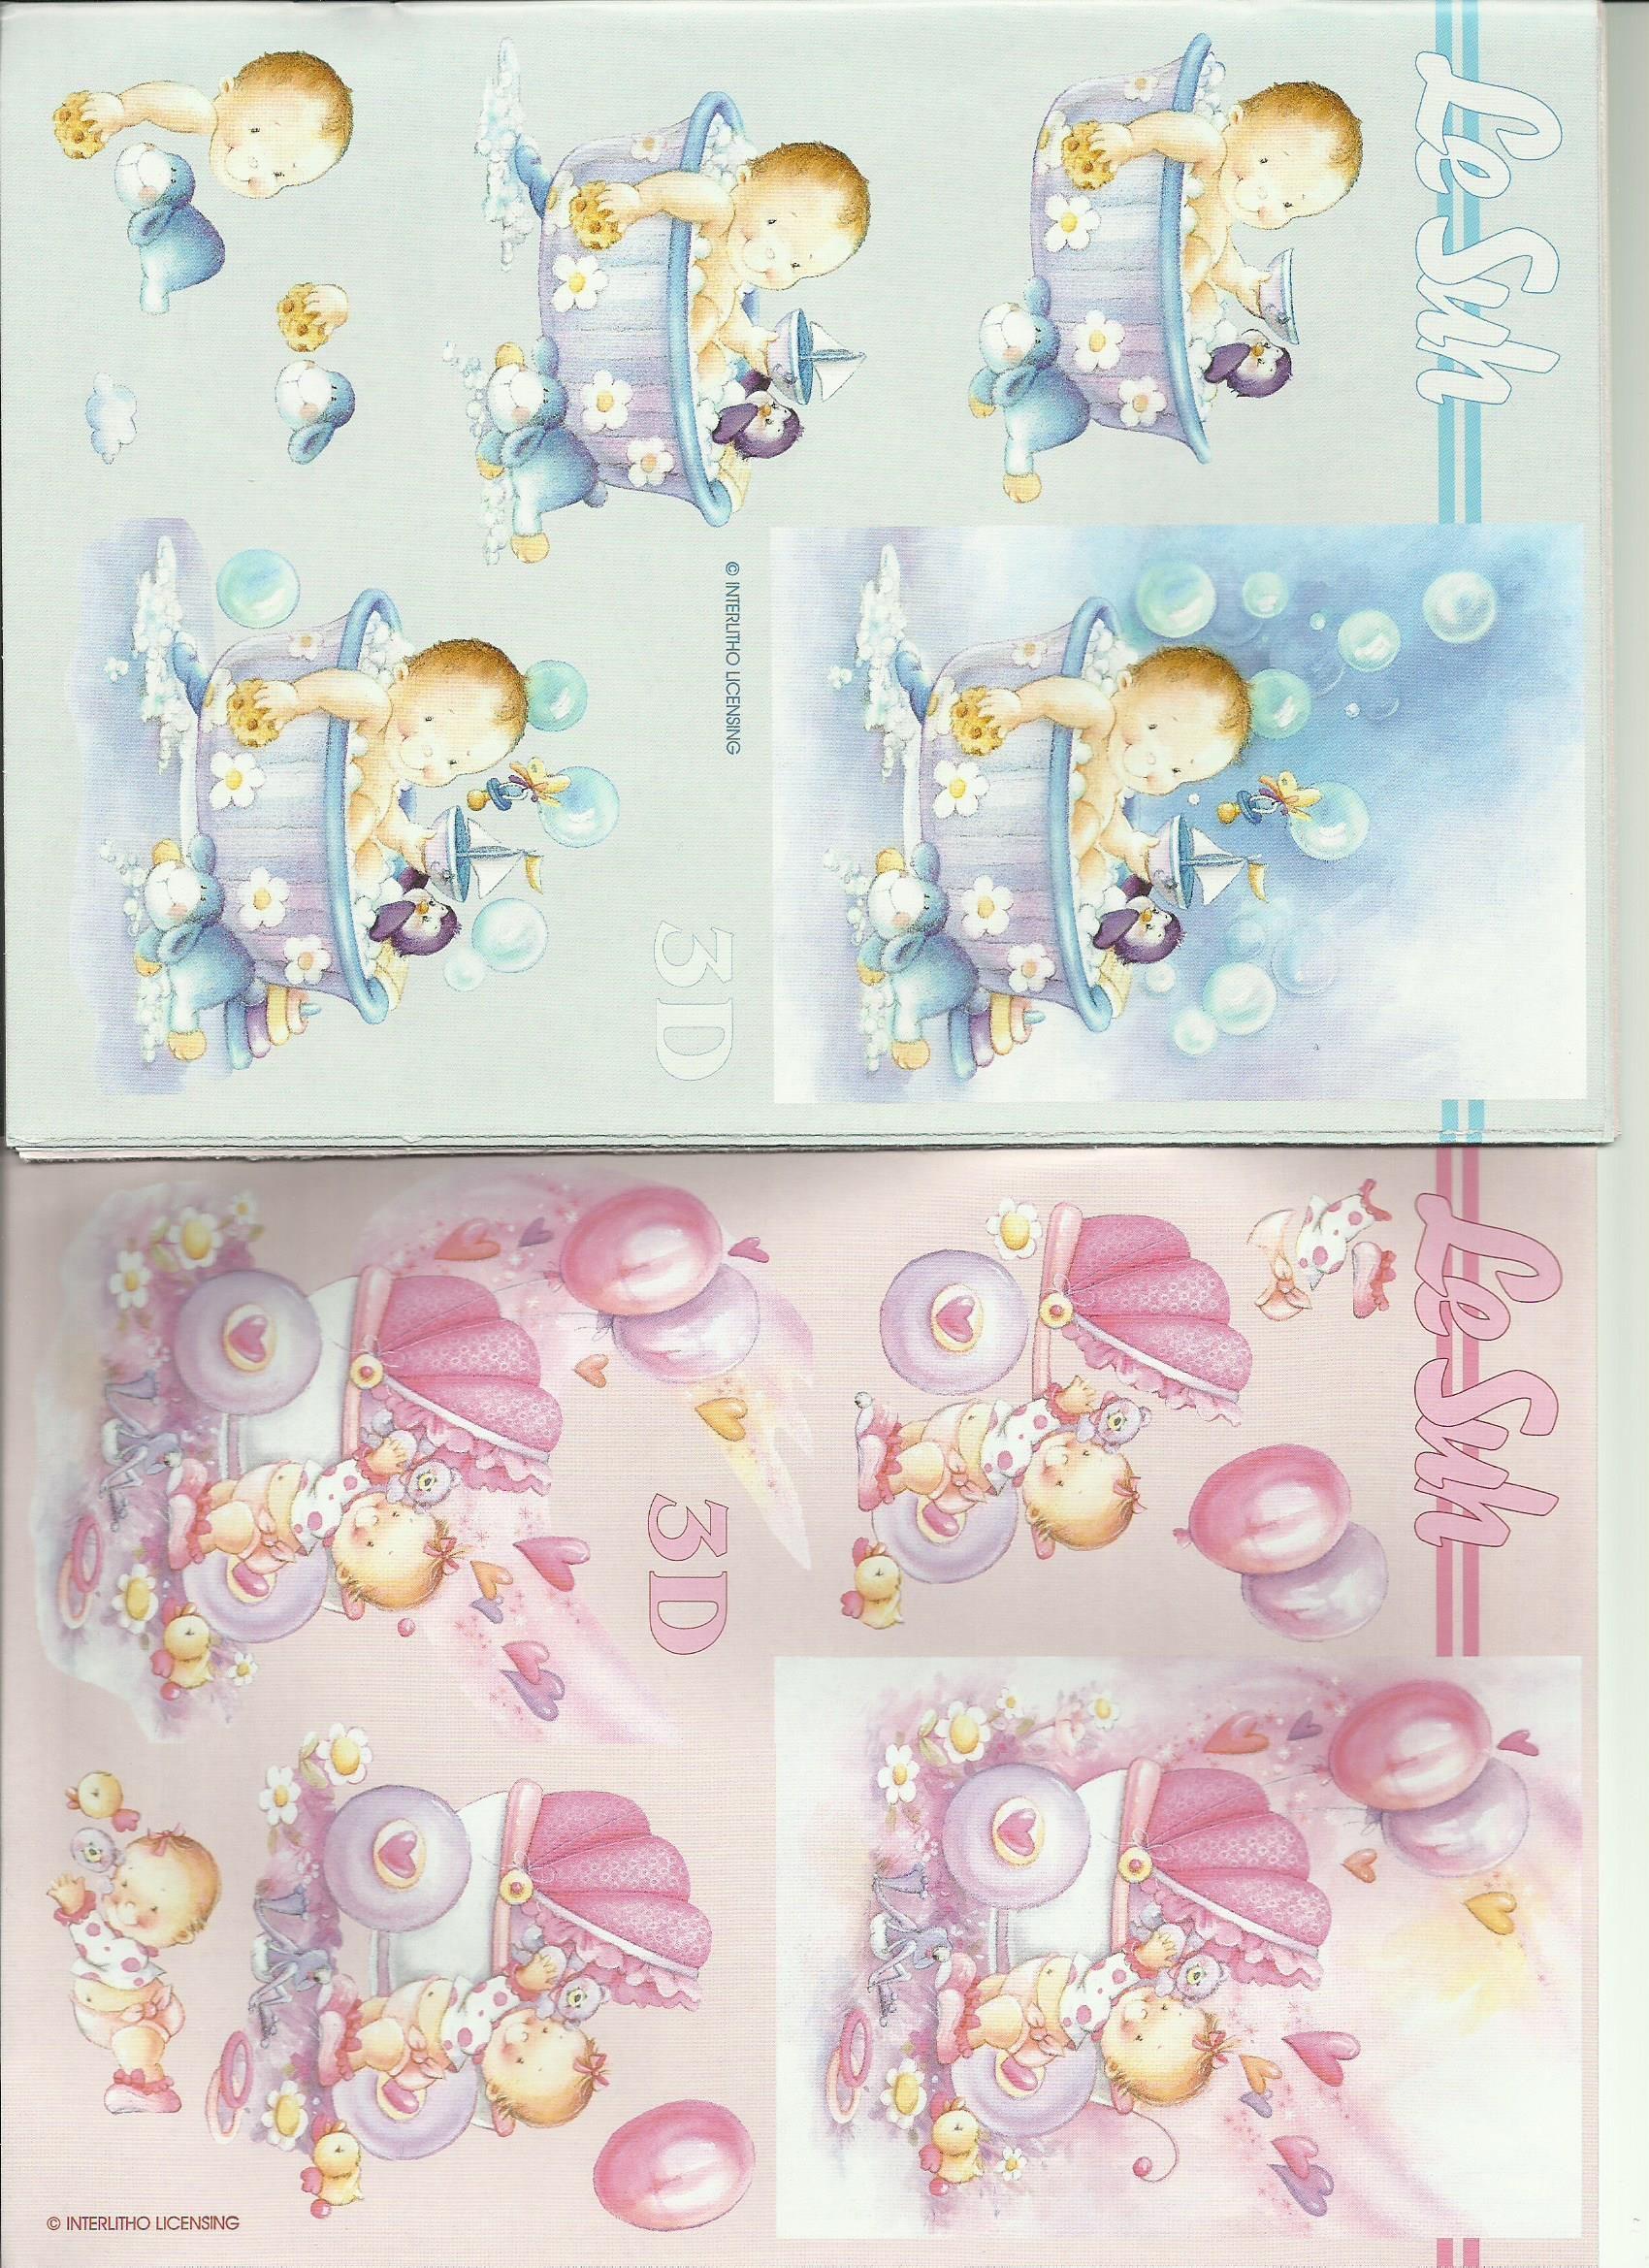 Image Du Blog Creamoune Centerblog Net With Images Decoupage Diy Rekodzielo